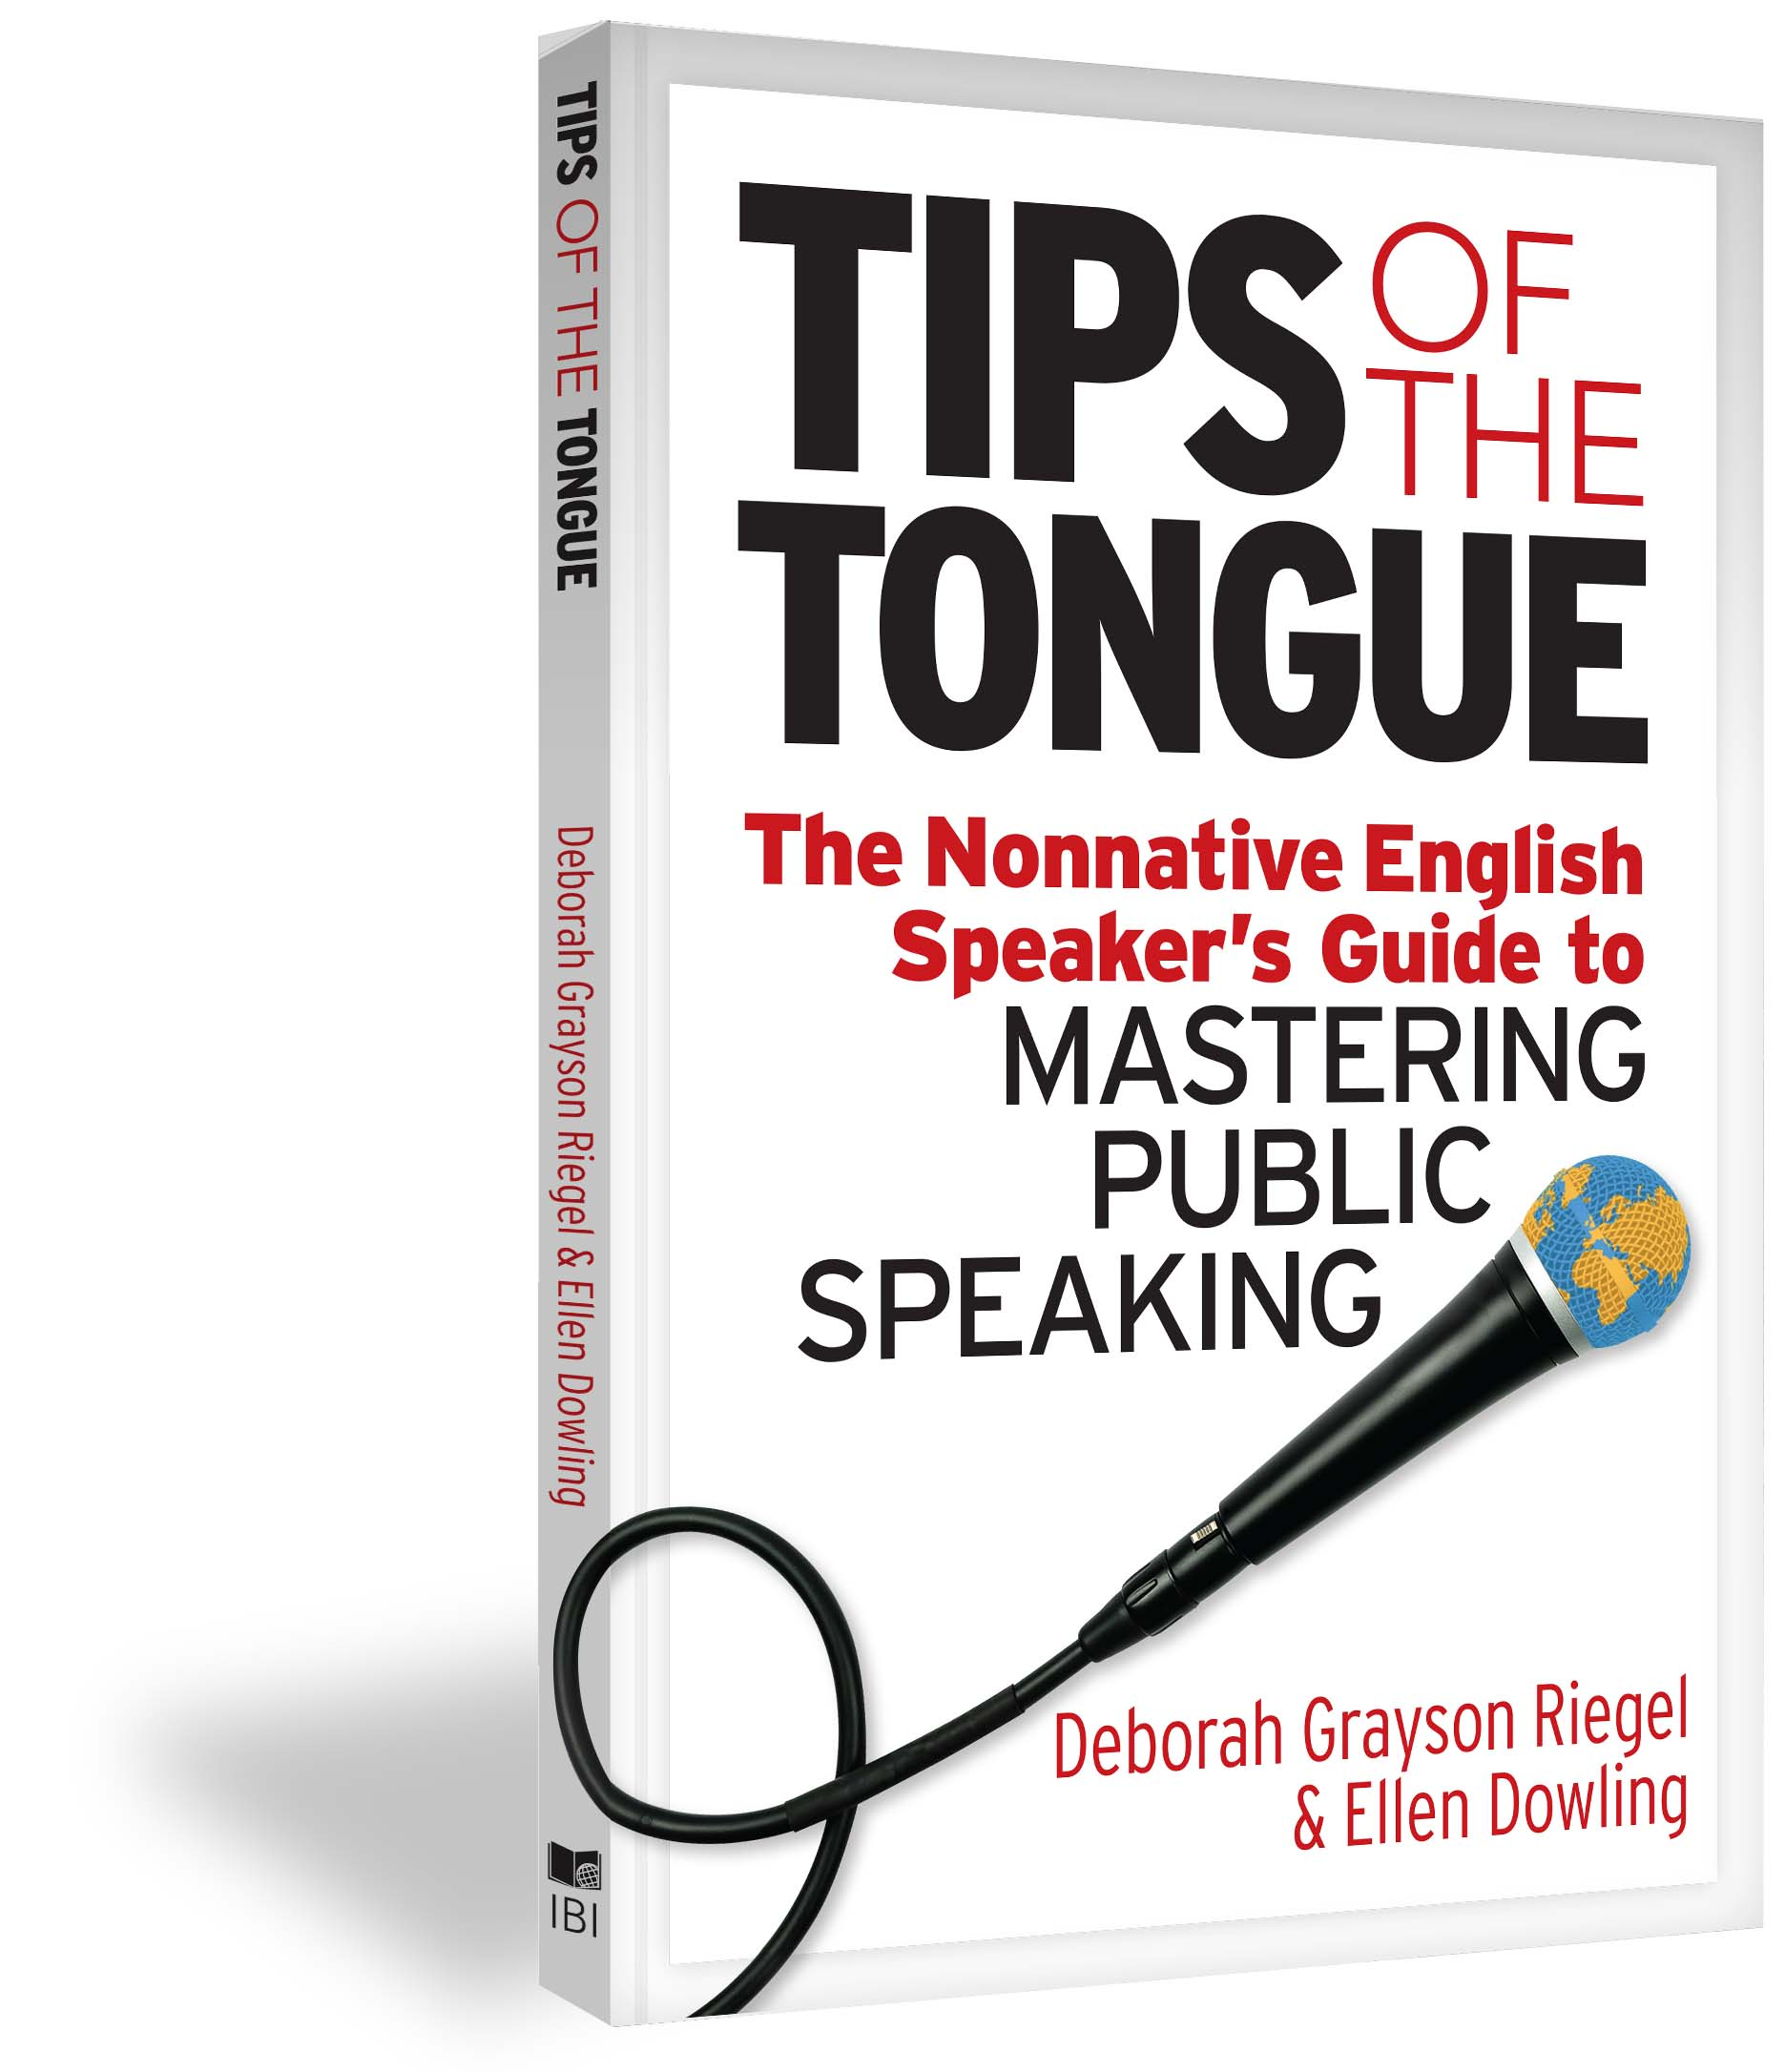 Tips of the Tongue - Deborah Grayson Riegel & Ellen Dowling